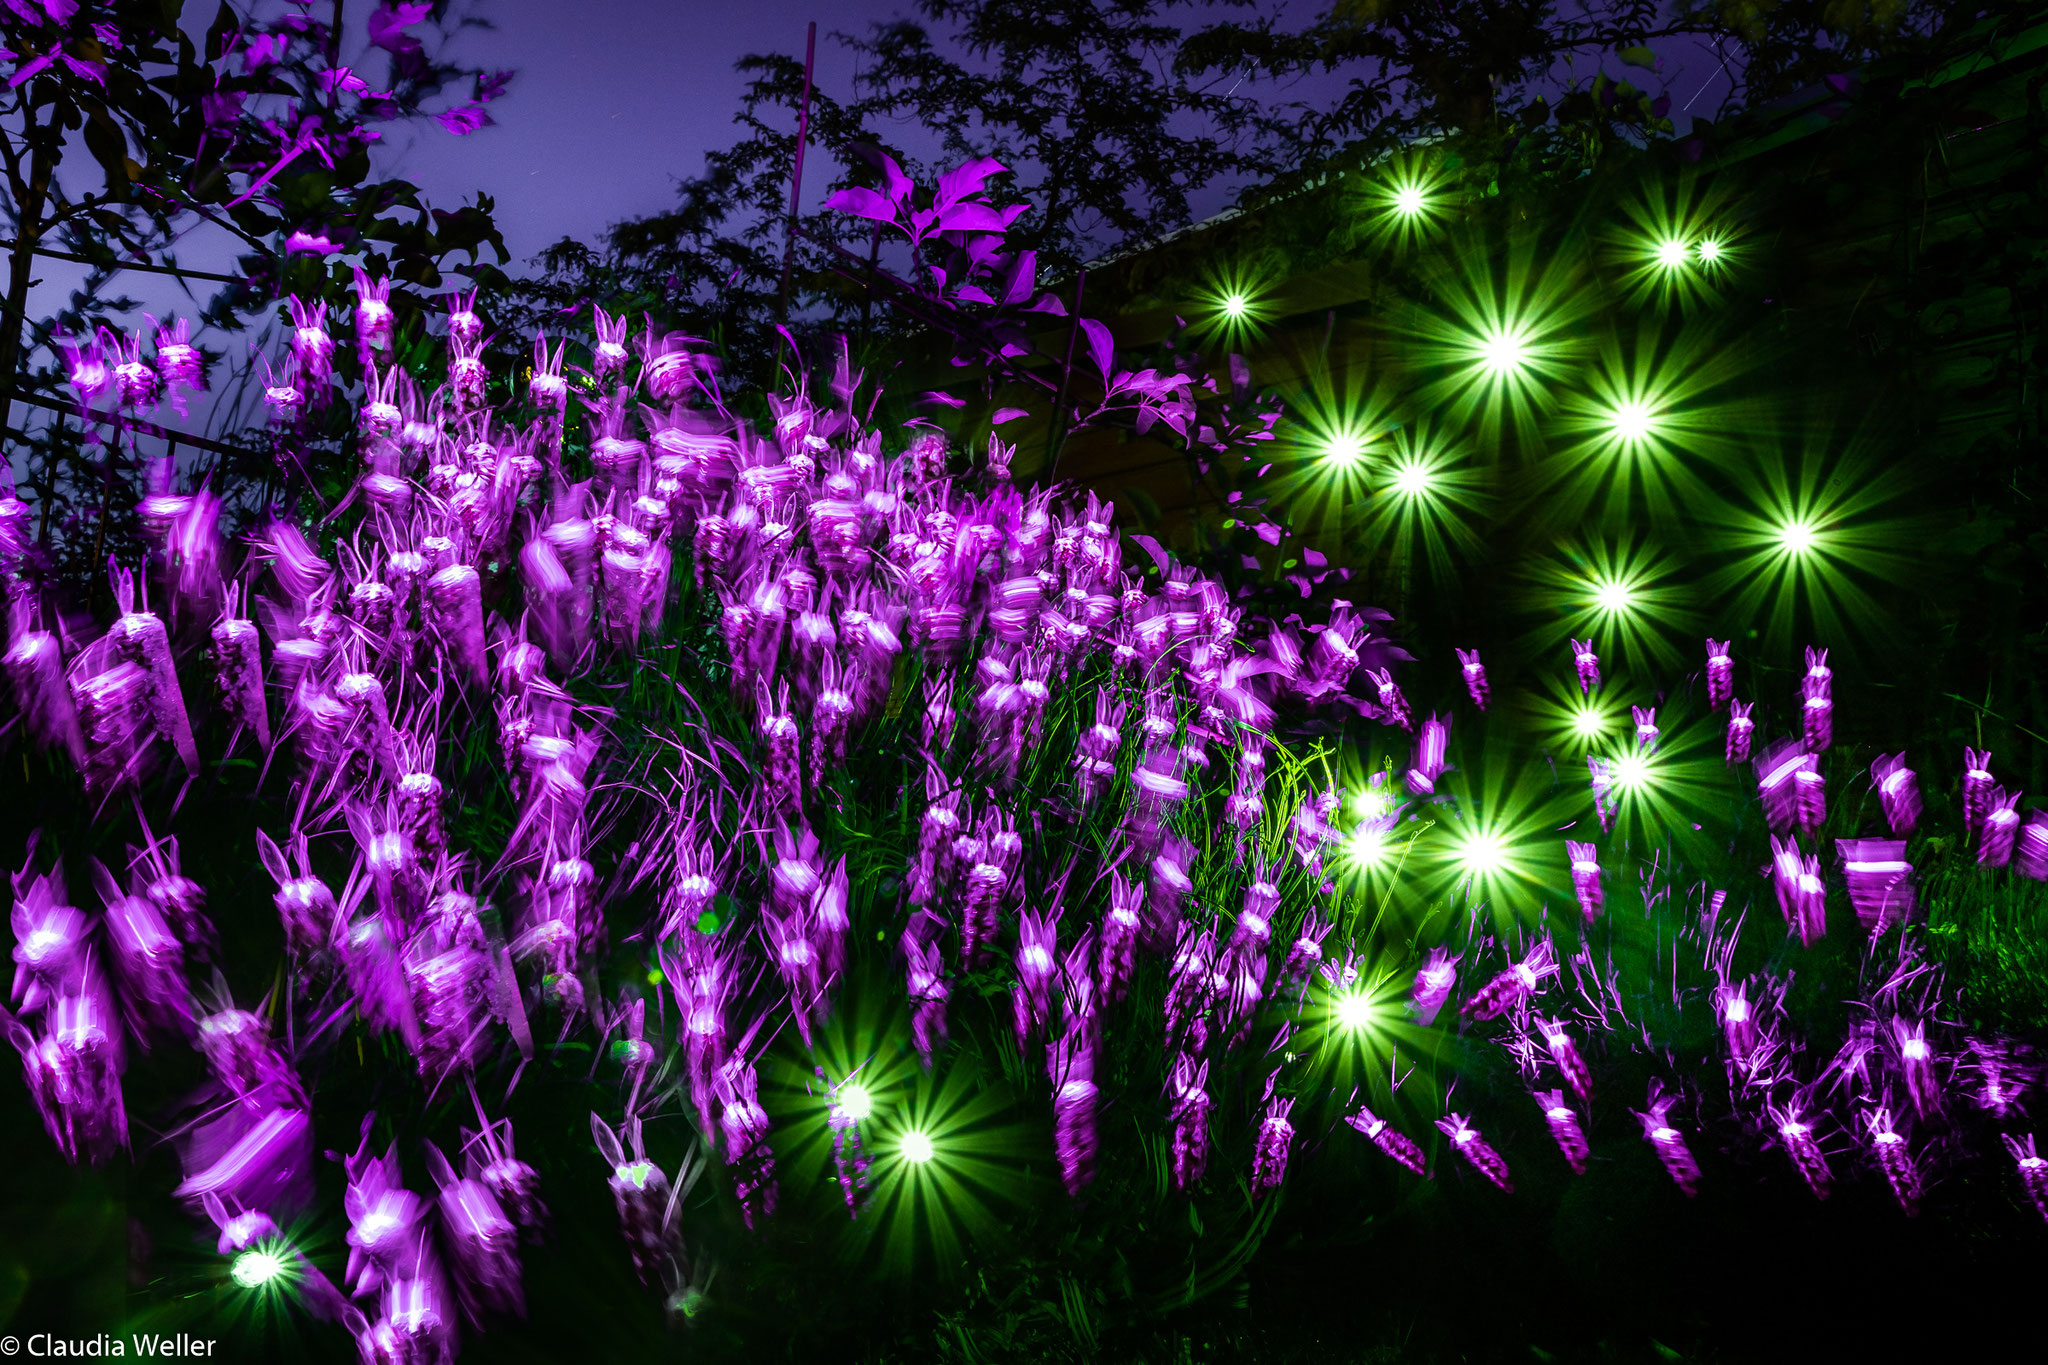 Lavendelblömkes im Garten